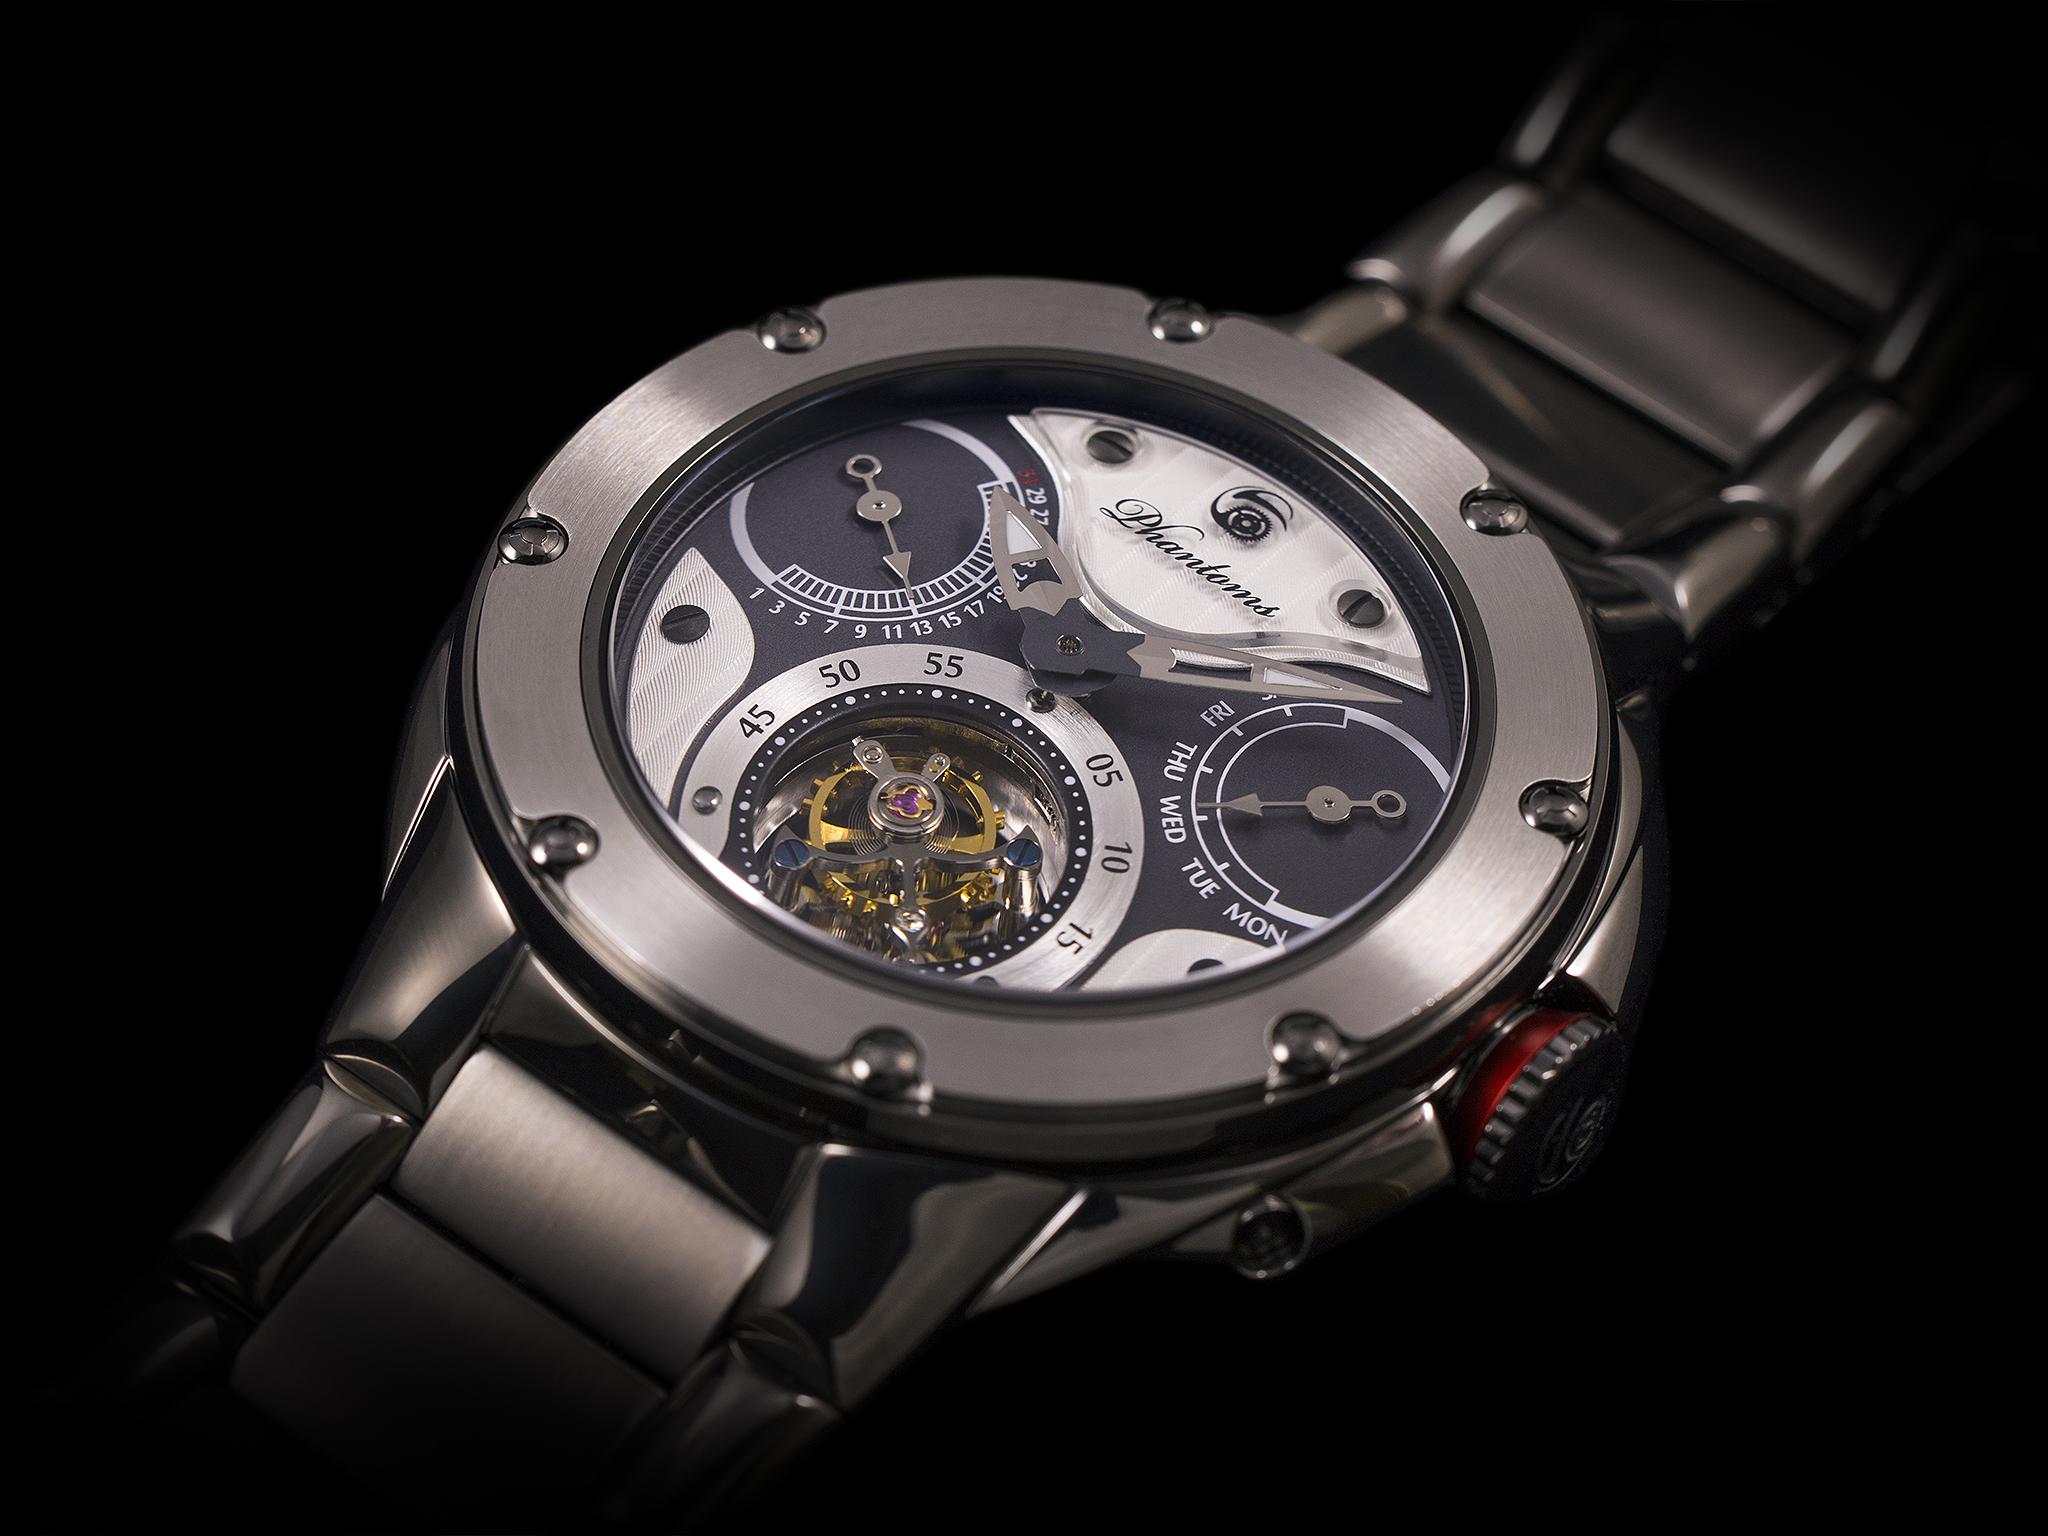 Phantoms Visionary Soul Tourbillon Mechanical Watch